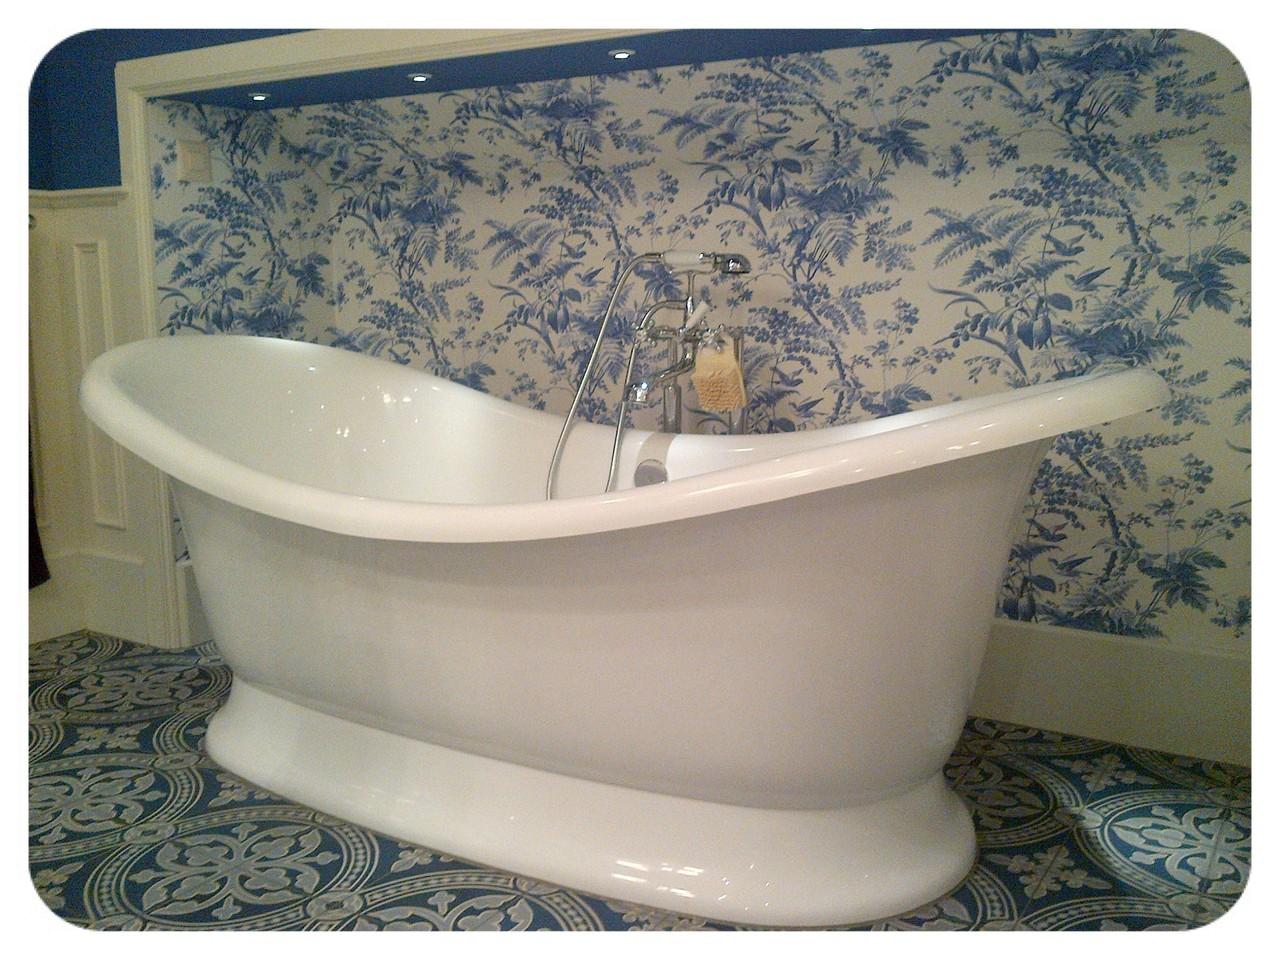 Freisthende Badewanne